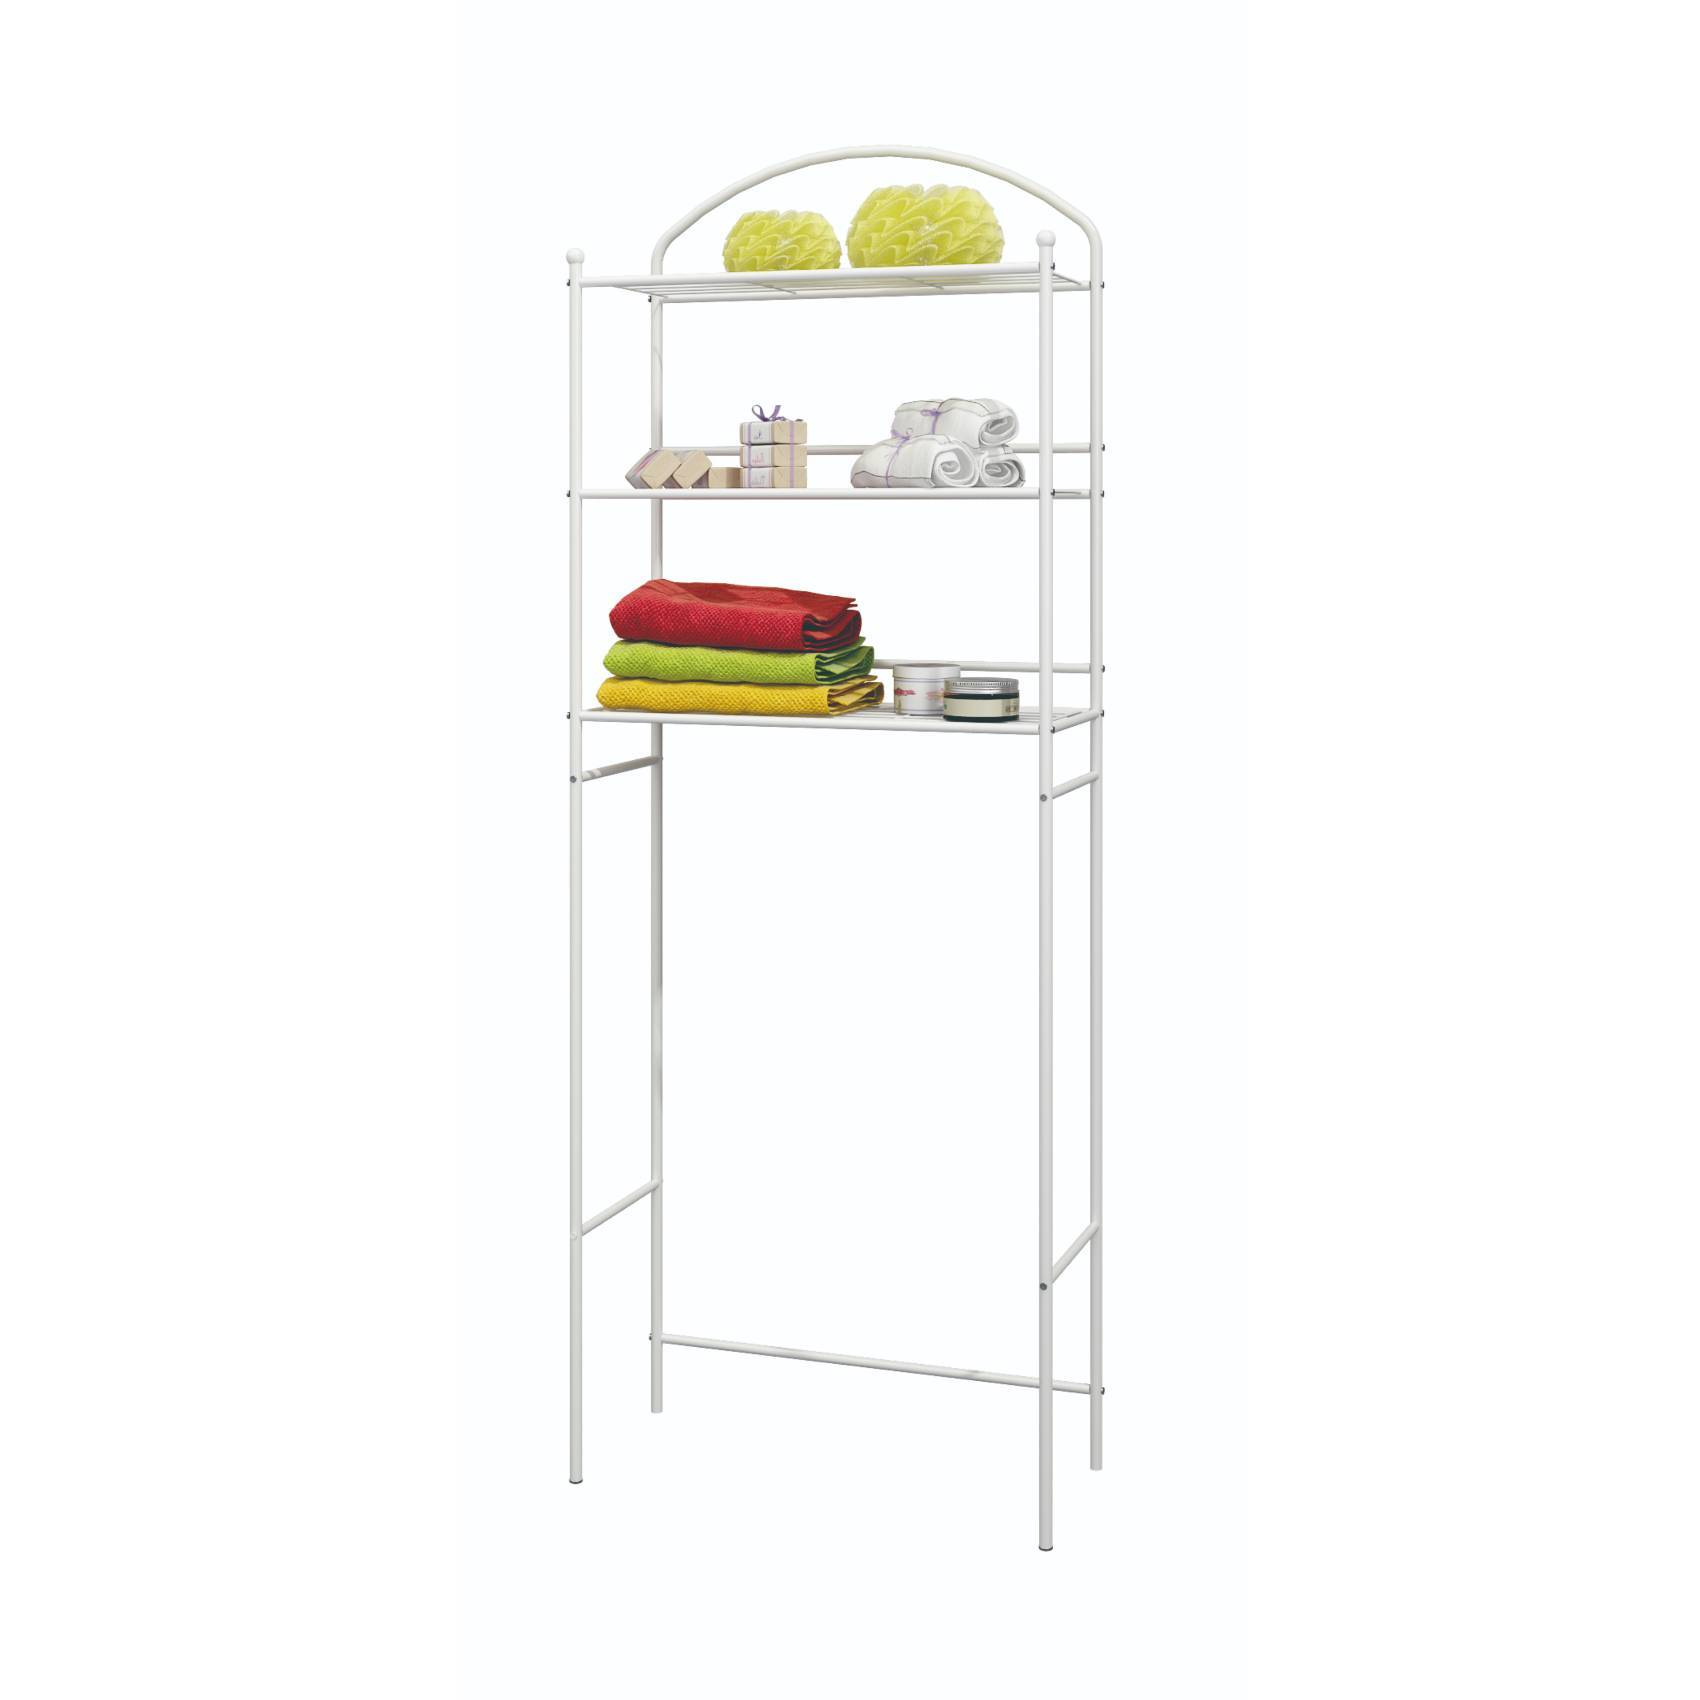 Buy Toilet Storage Rack Over Bathroom Shelf Organizer Online Shop Home Garden On Carrefour Uae